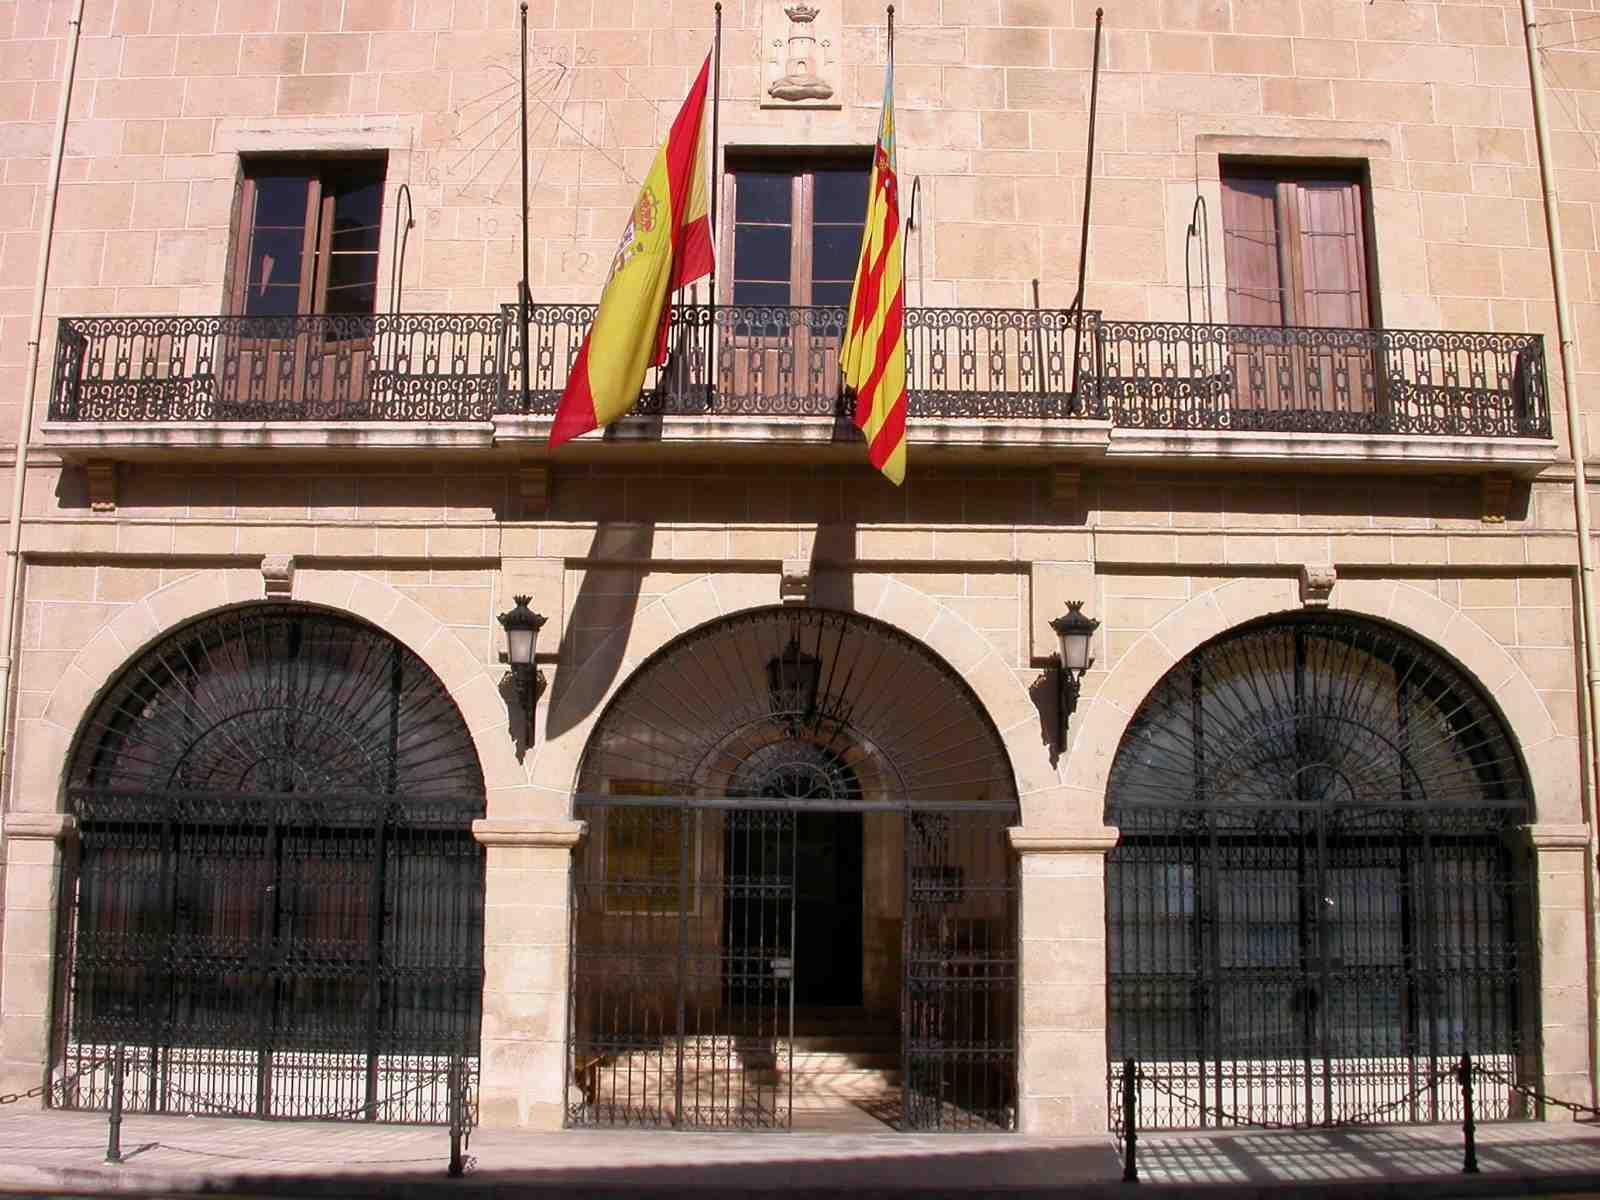 Castalla s'adherix al Codi Ètic del Turisme Valencià